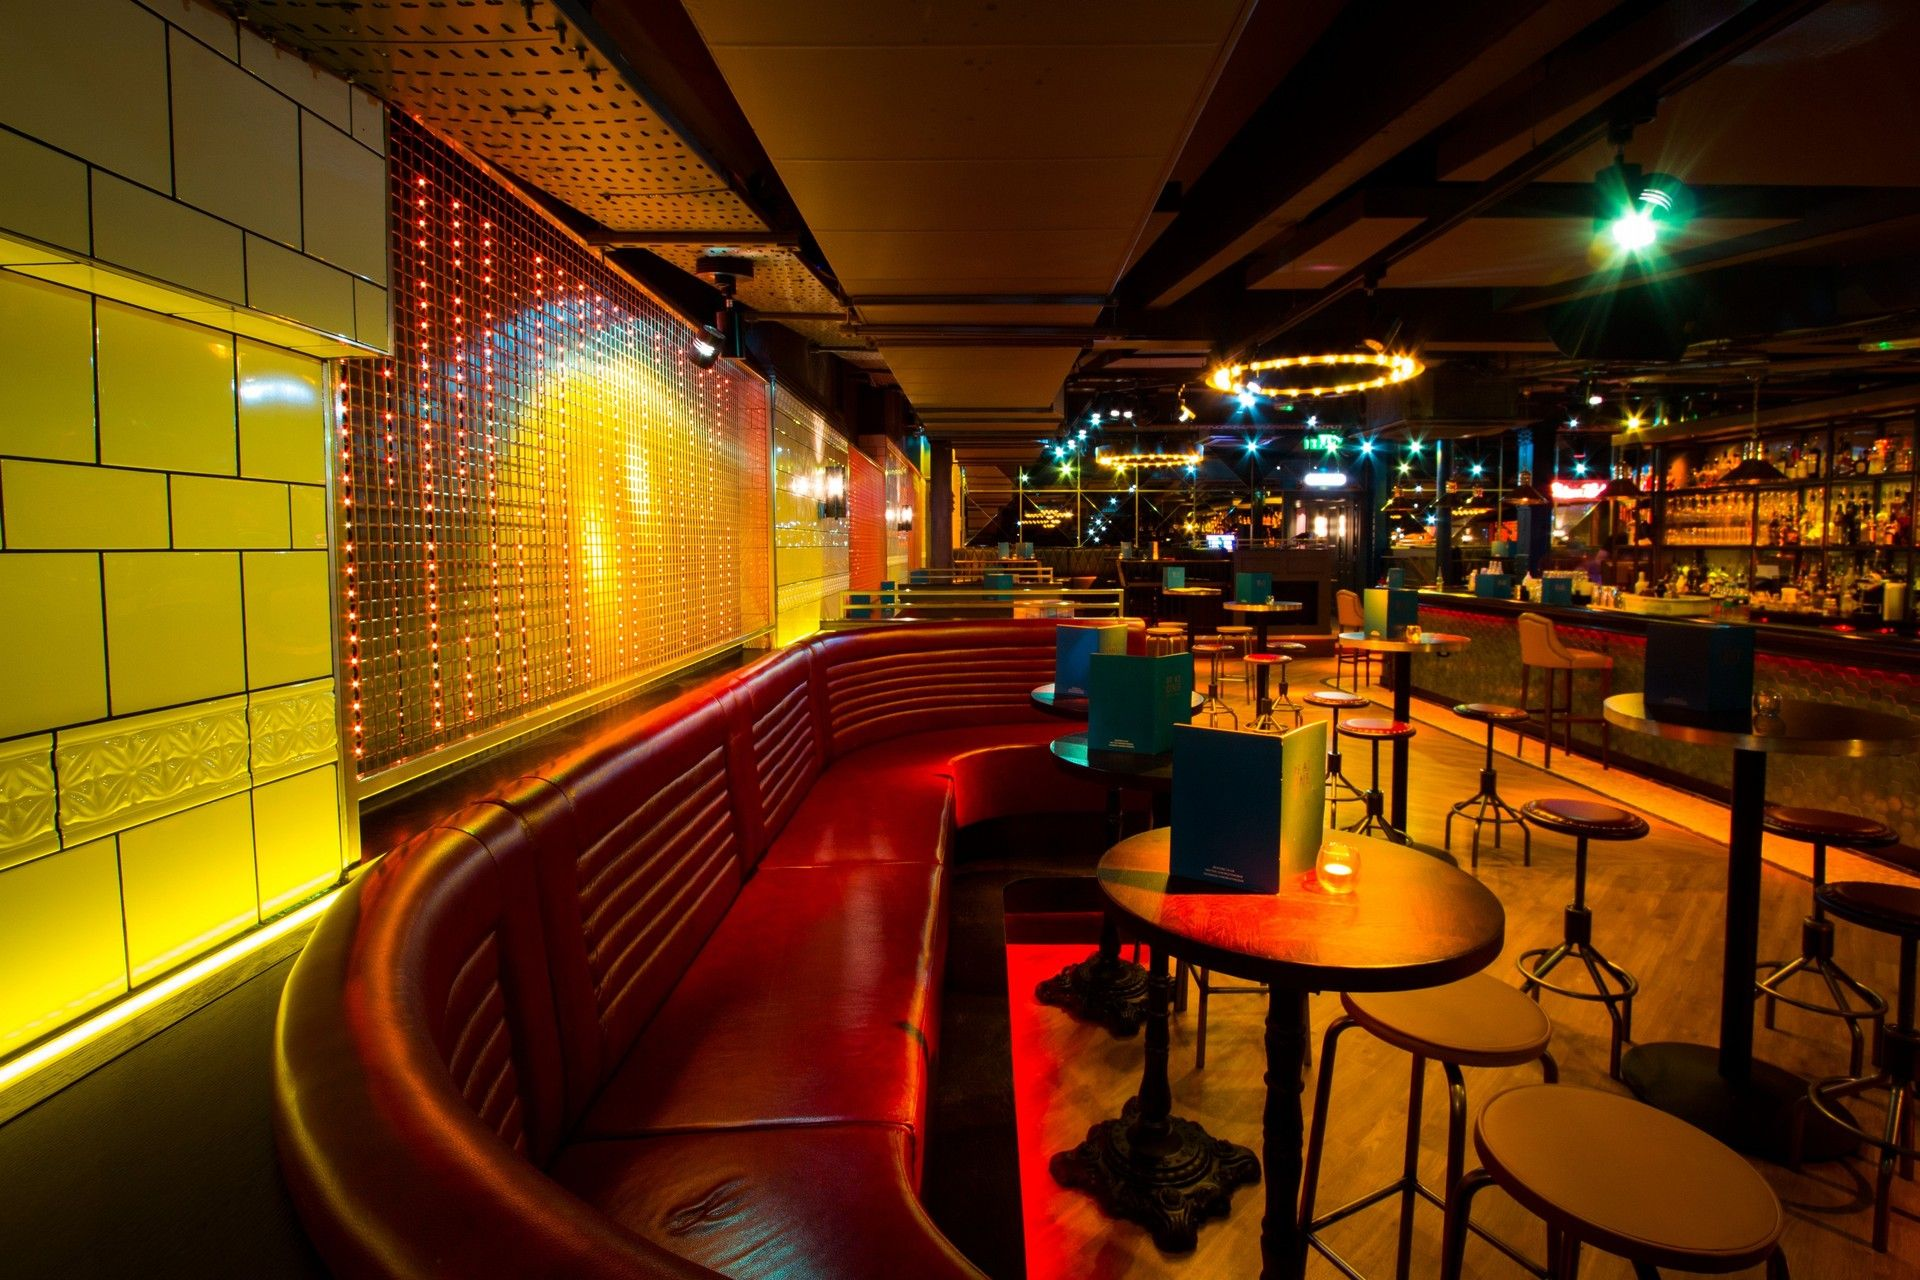 Be At One Tile suppliers, Birmingham bars, Ceramics